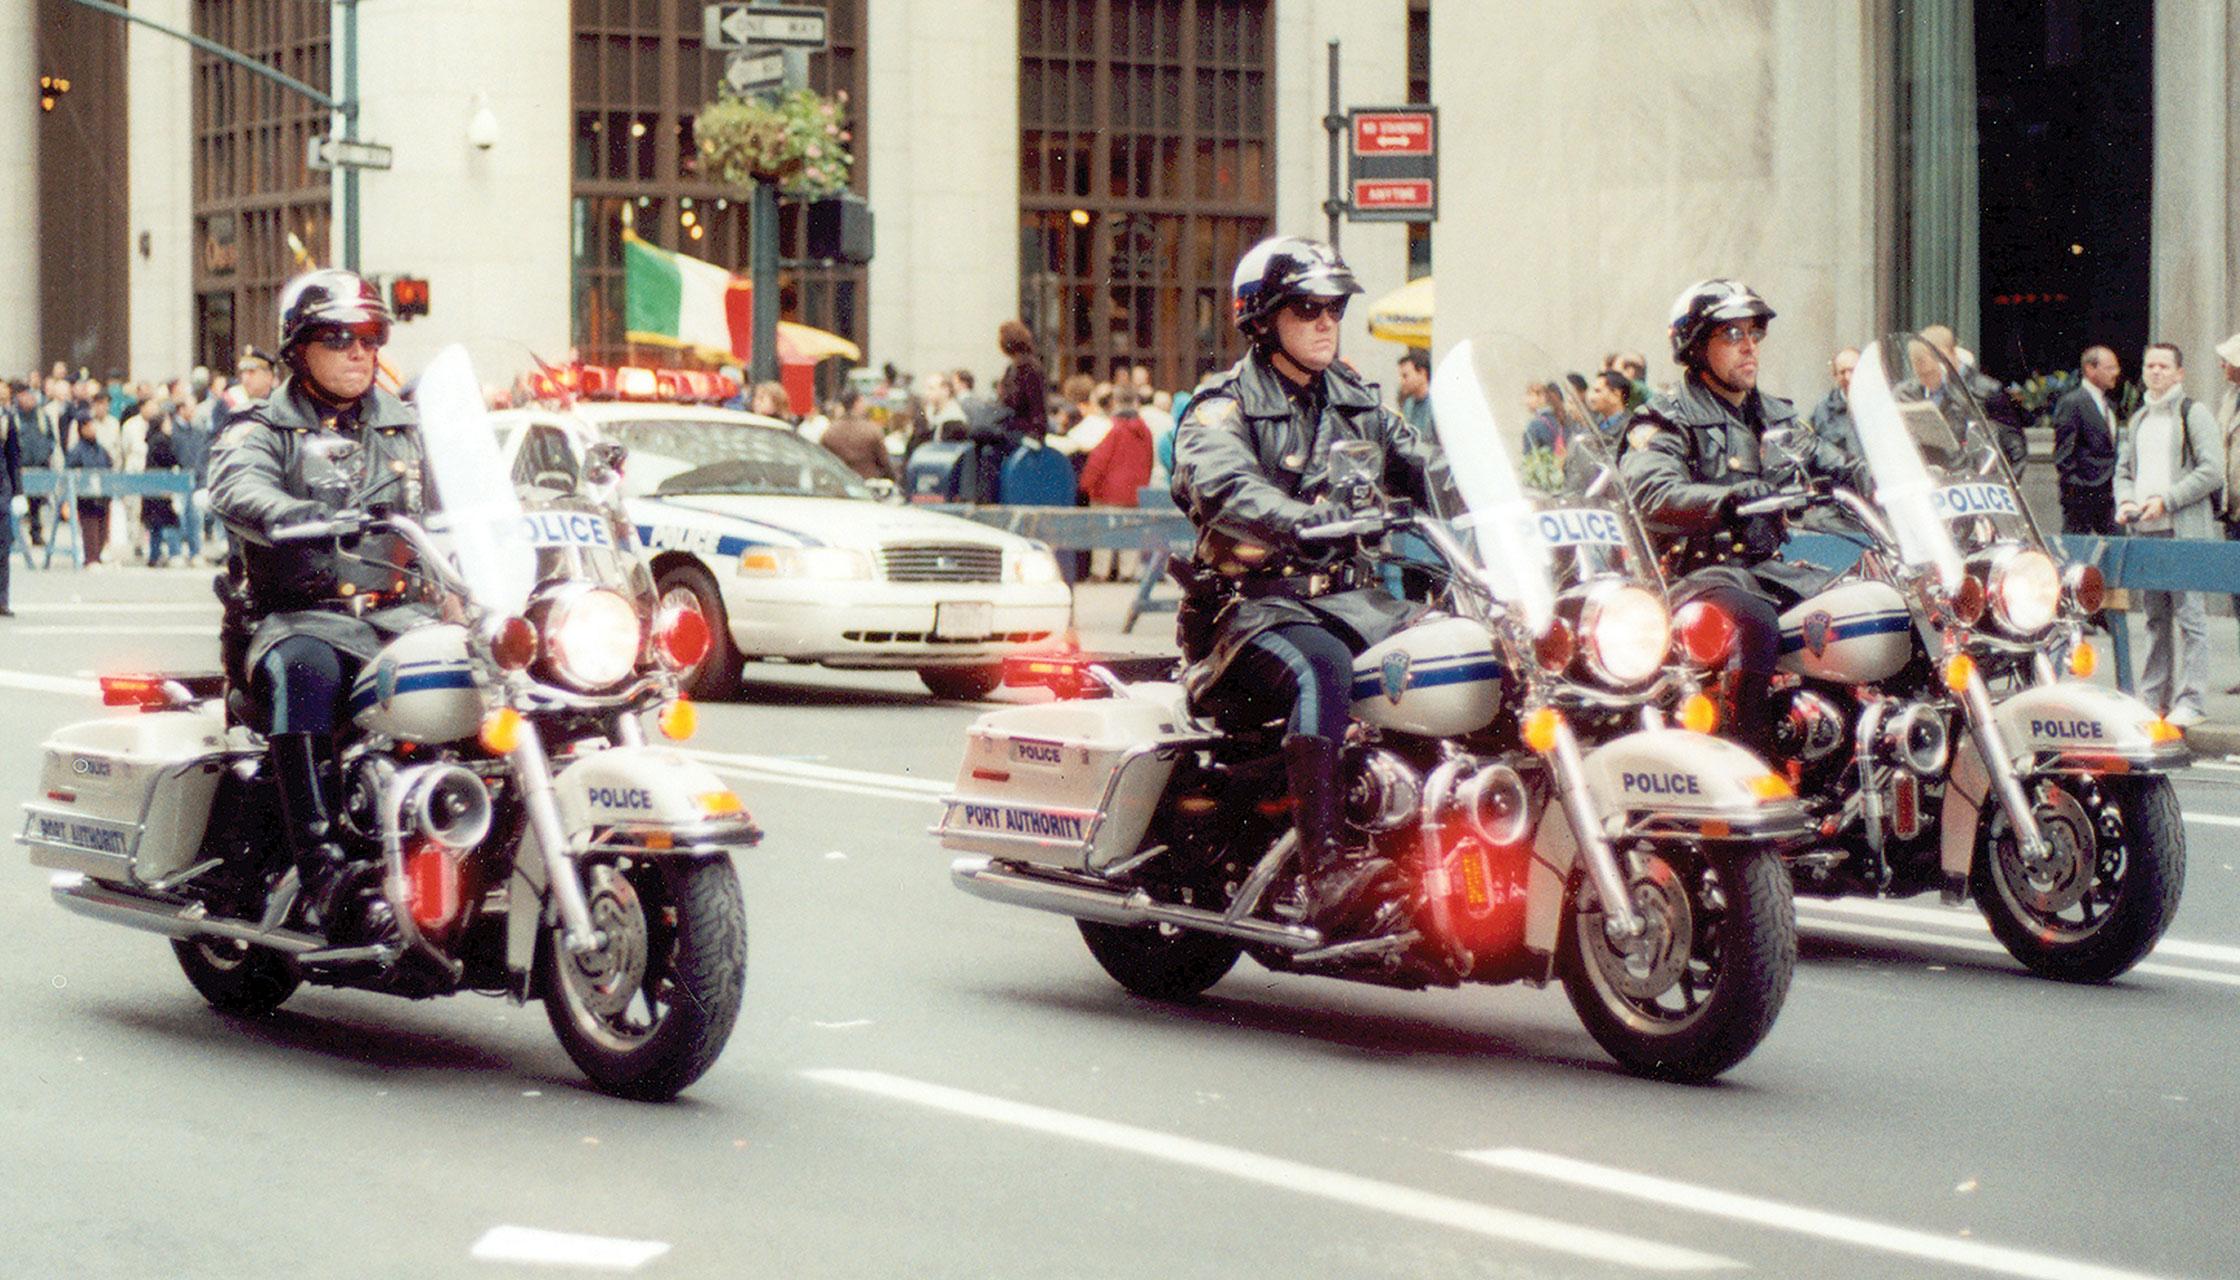 motor-parade-1980s